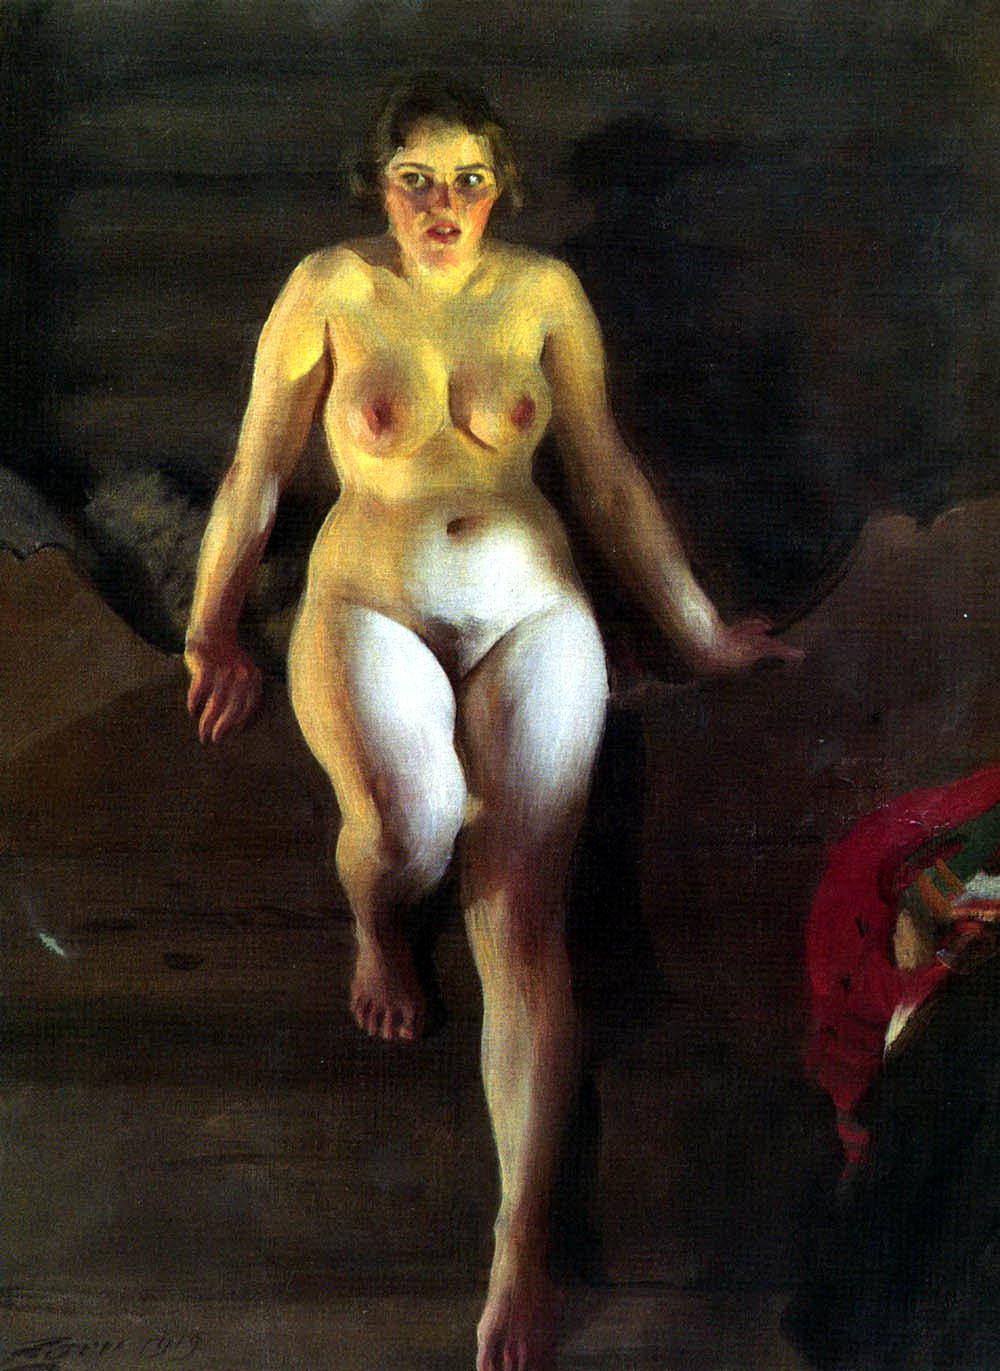 Anders Leonard Zorn. 1860-1920. Обнаженная на кровати. 1919, 100 х 75 см. Частная коллекция